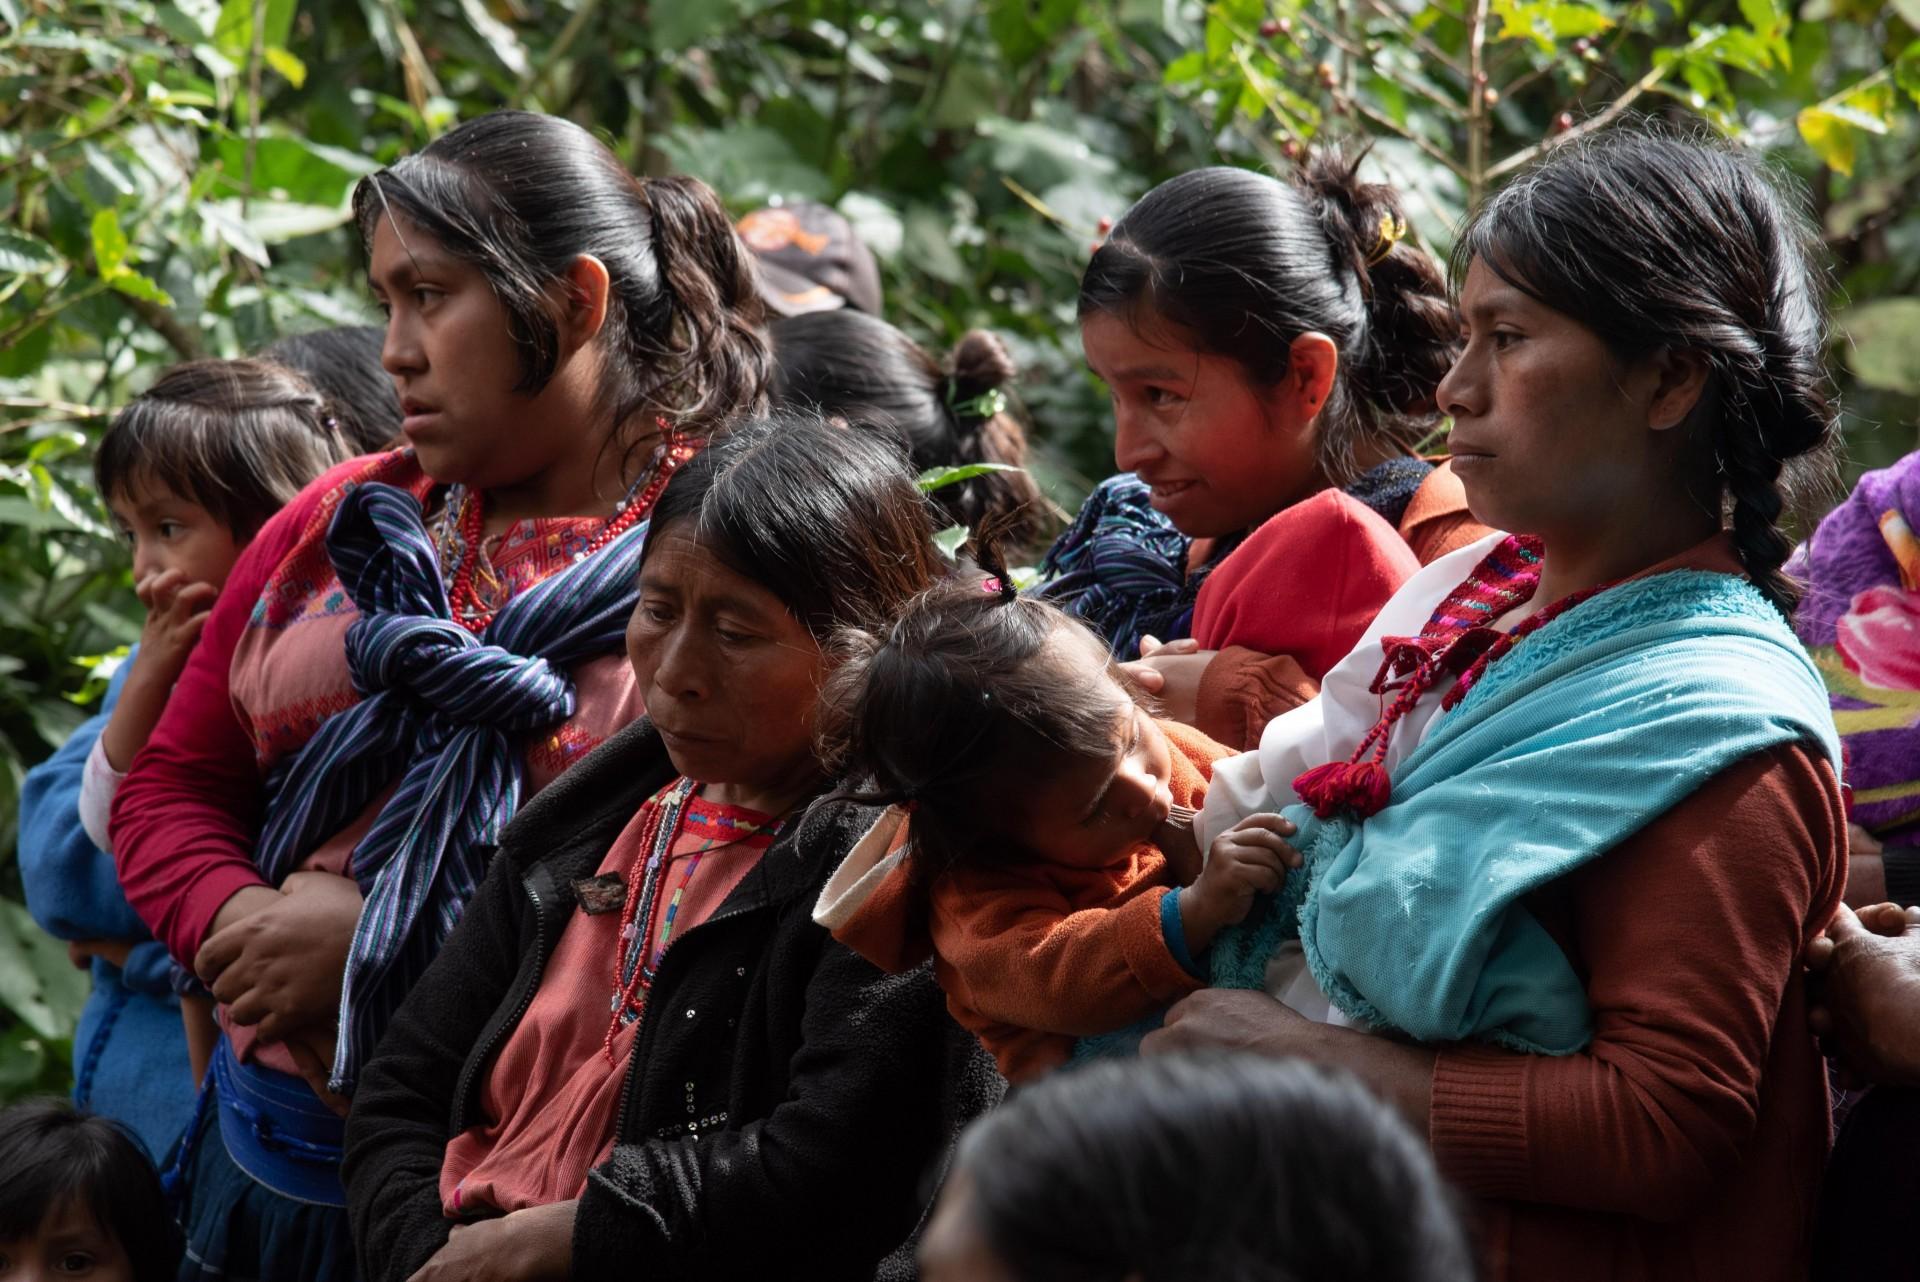 Piden adecuar información sobre pandemia a indígenas de Chiapas